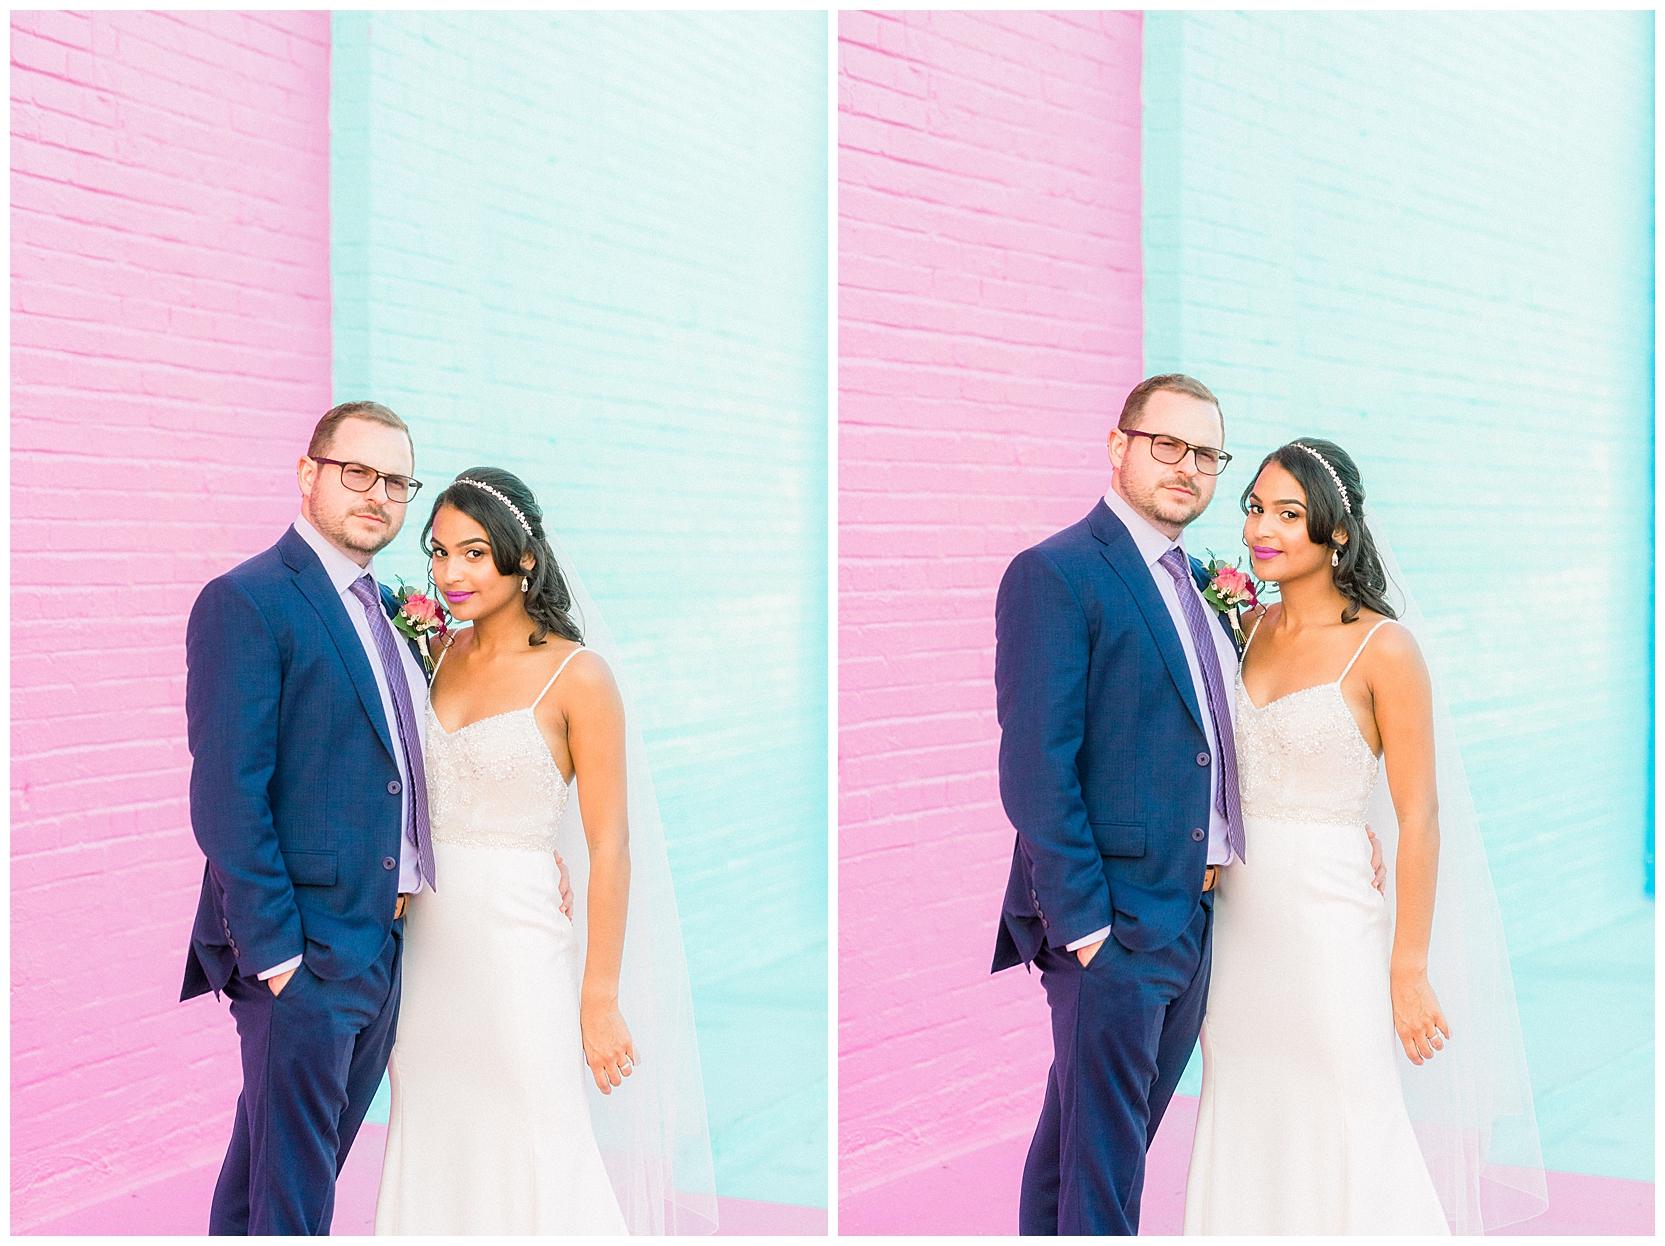 jessicafredericks_lakeland_tampa_wedding_purple_crazy hour_0063.jpg